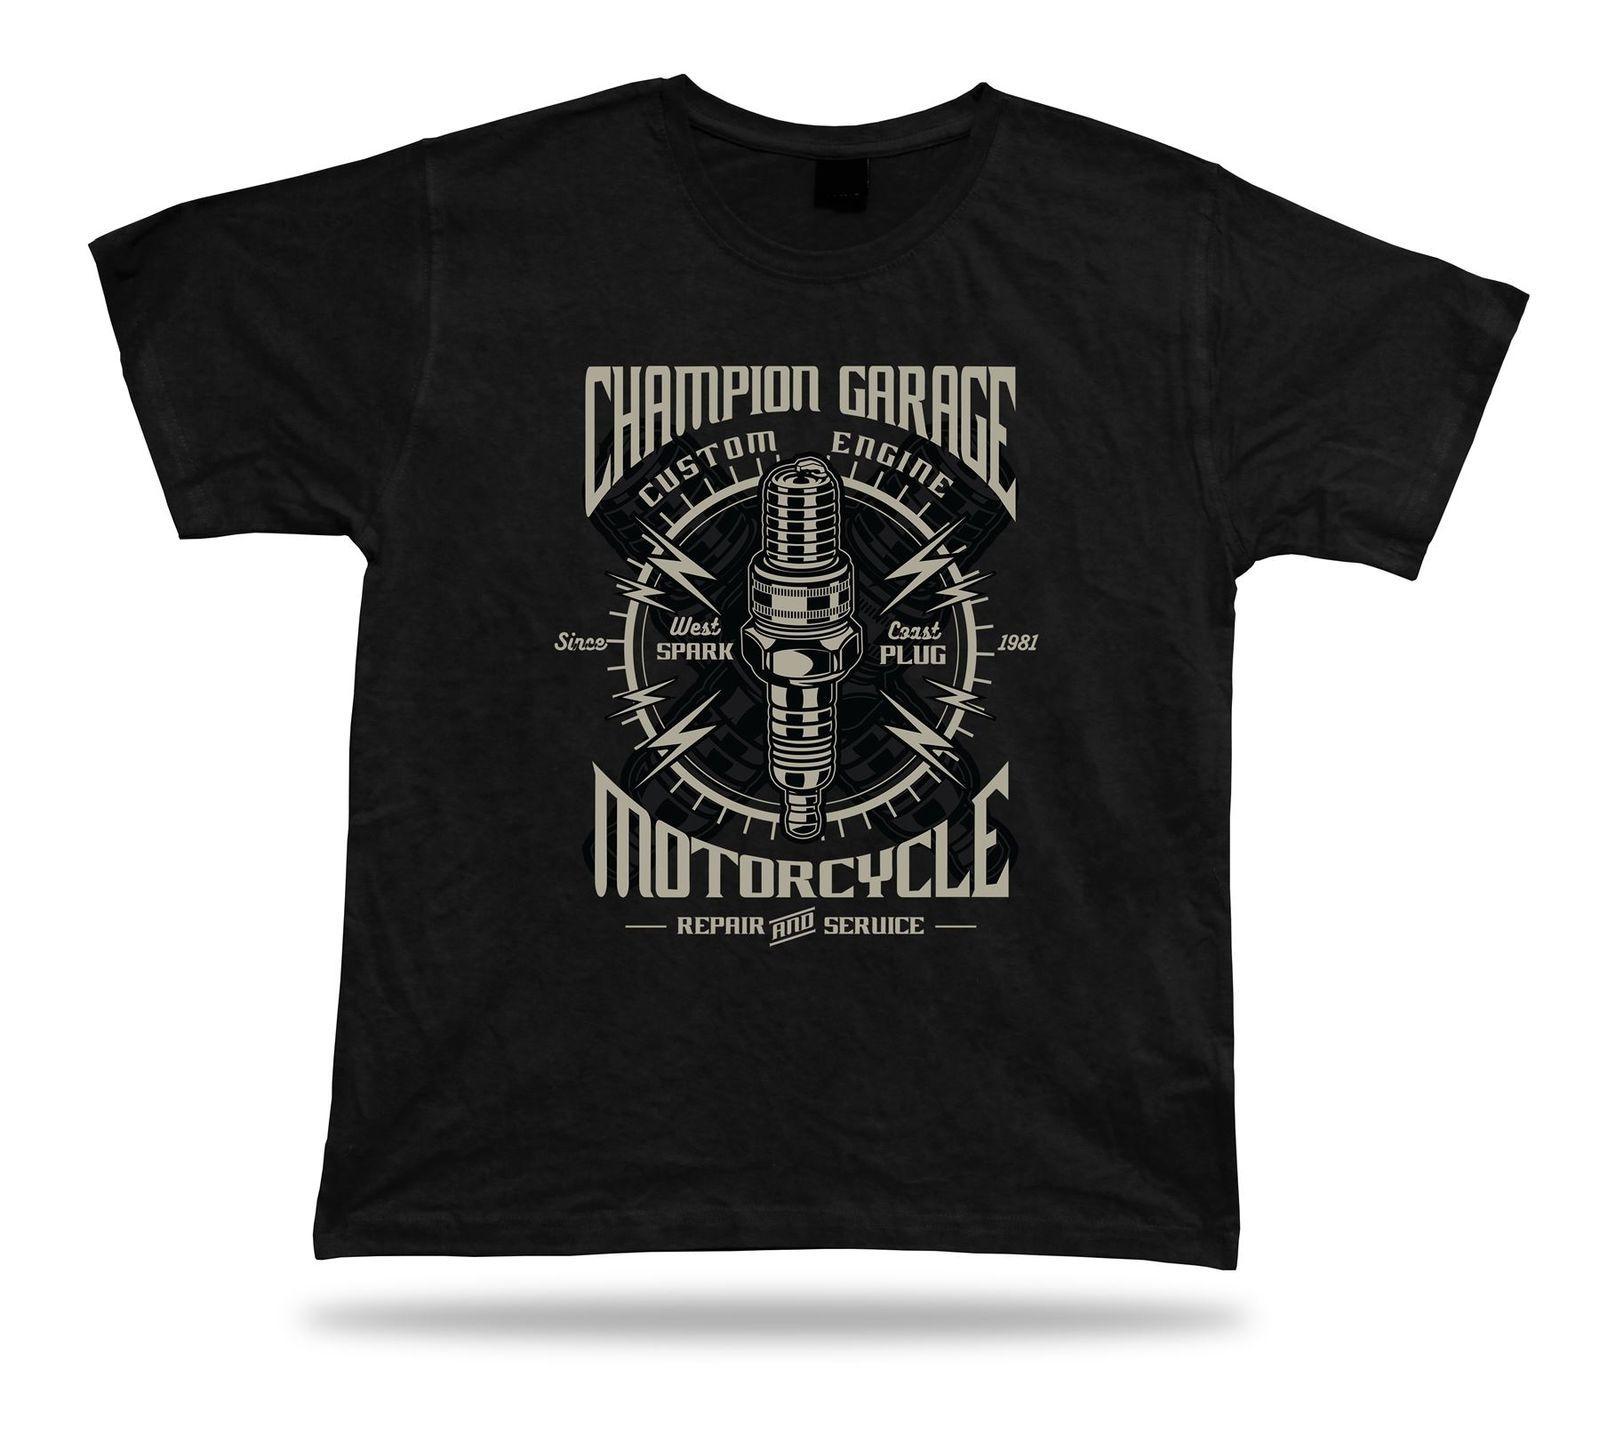 af0f17fb Good T Shirt Designs Ideas | Top Mode Depot